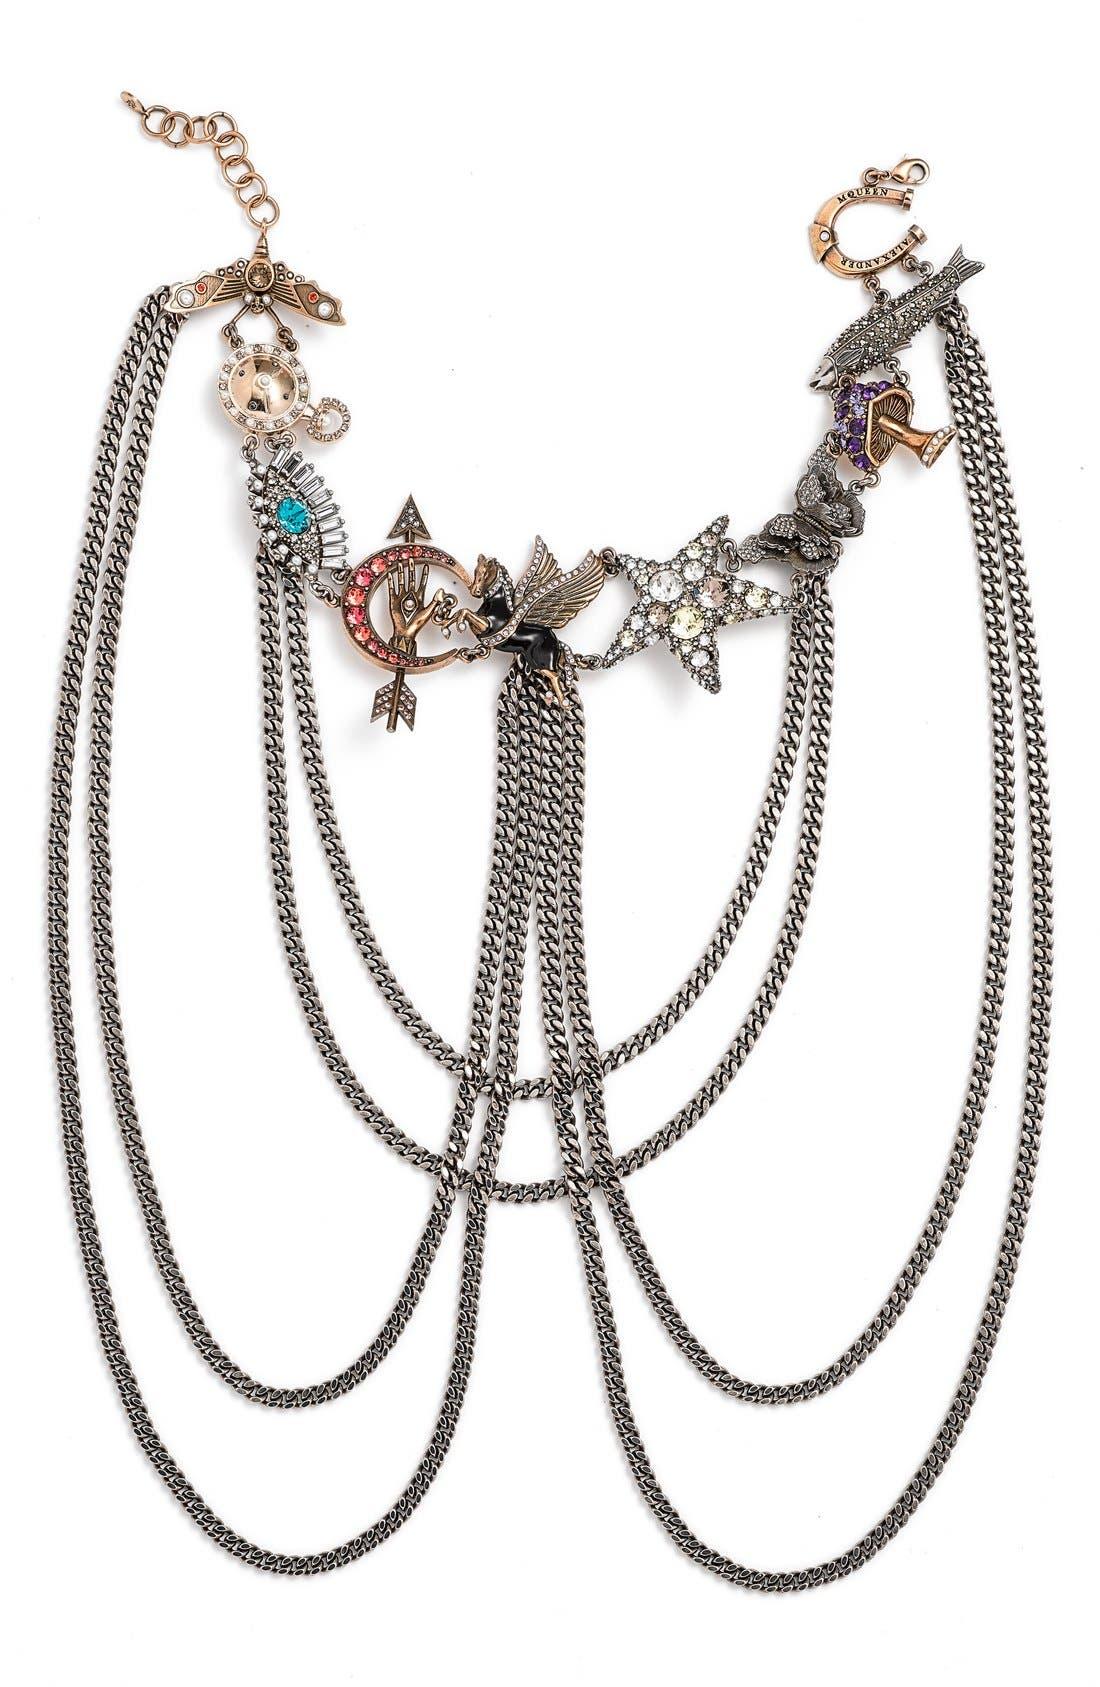 Main Image - Alexander McQueen 'Pegasus' Multistrand Necklace